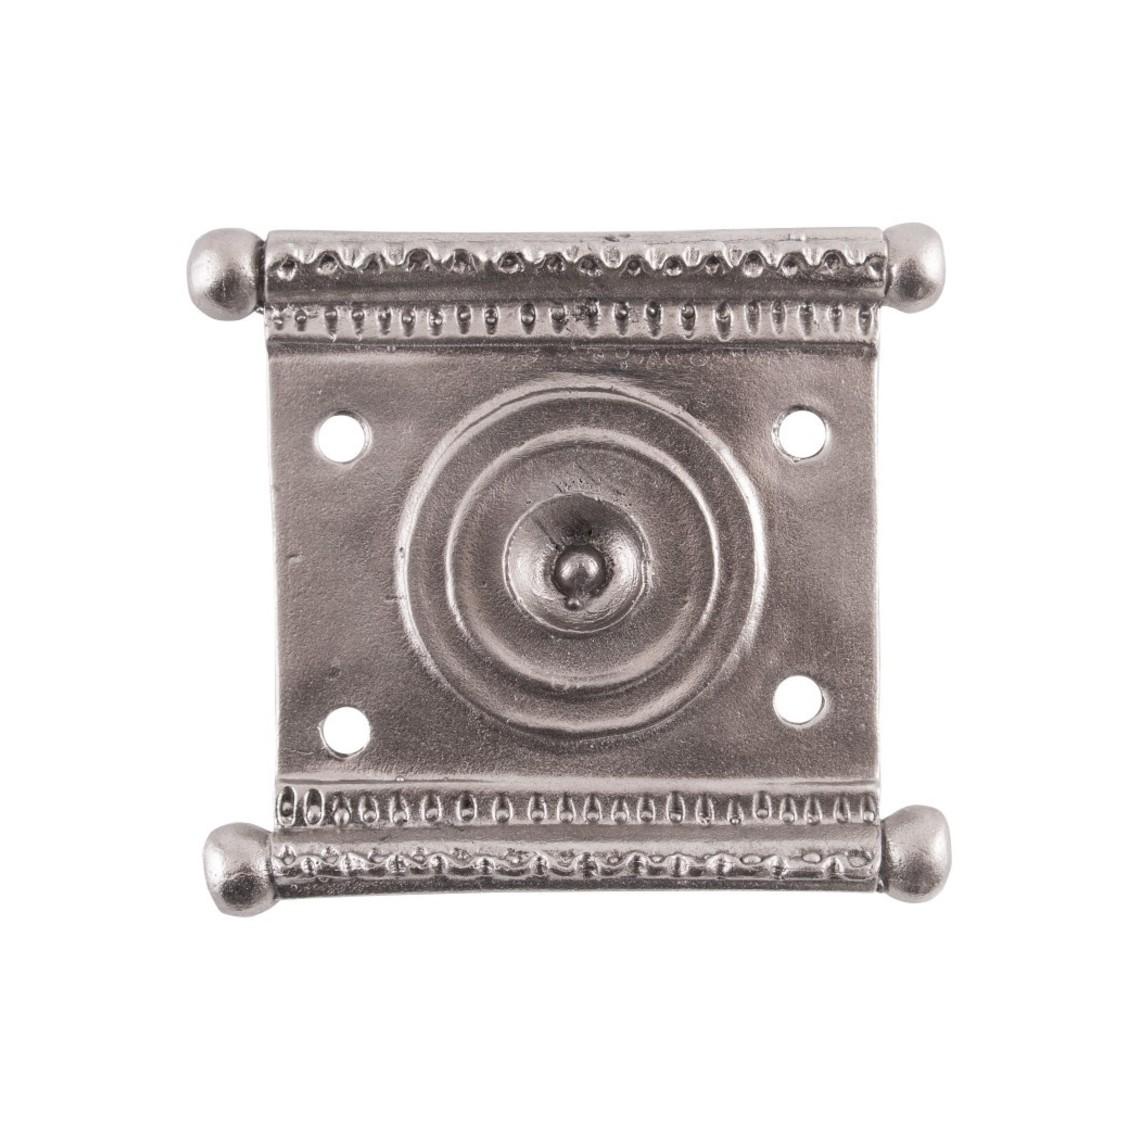 Deepeeka ceinture romaine montage Tekija, laiton en boîte